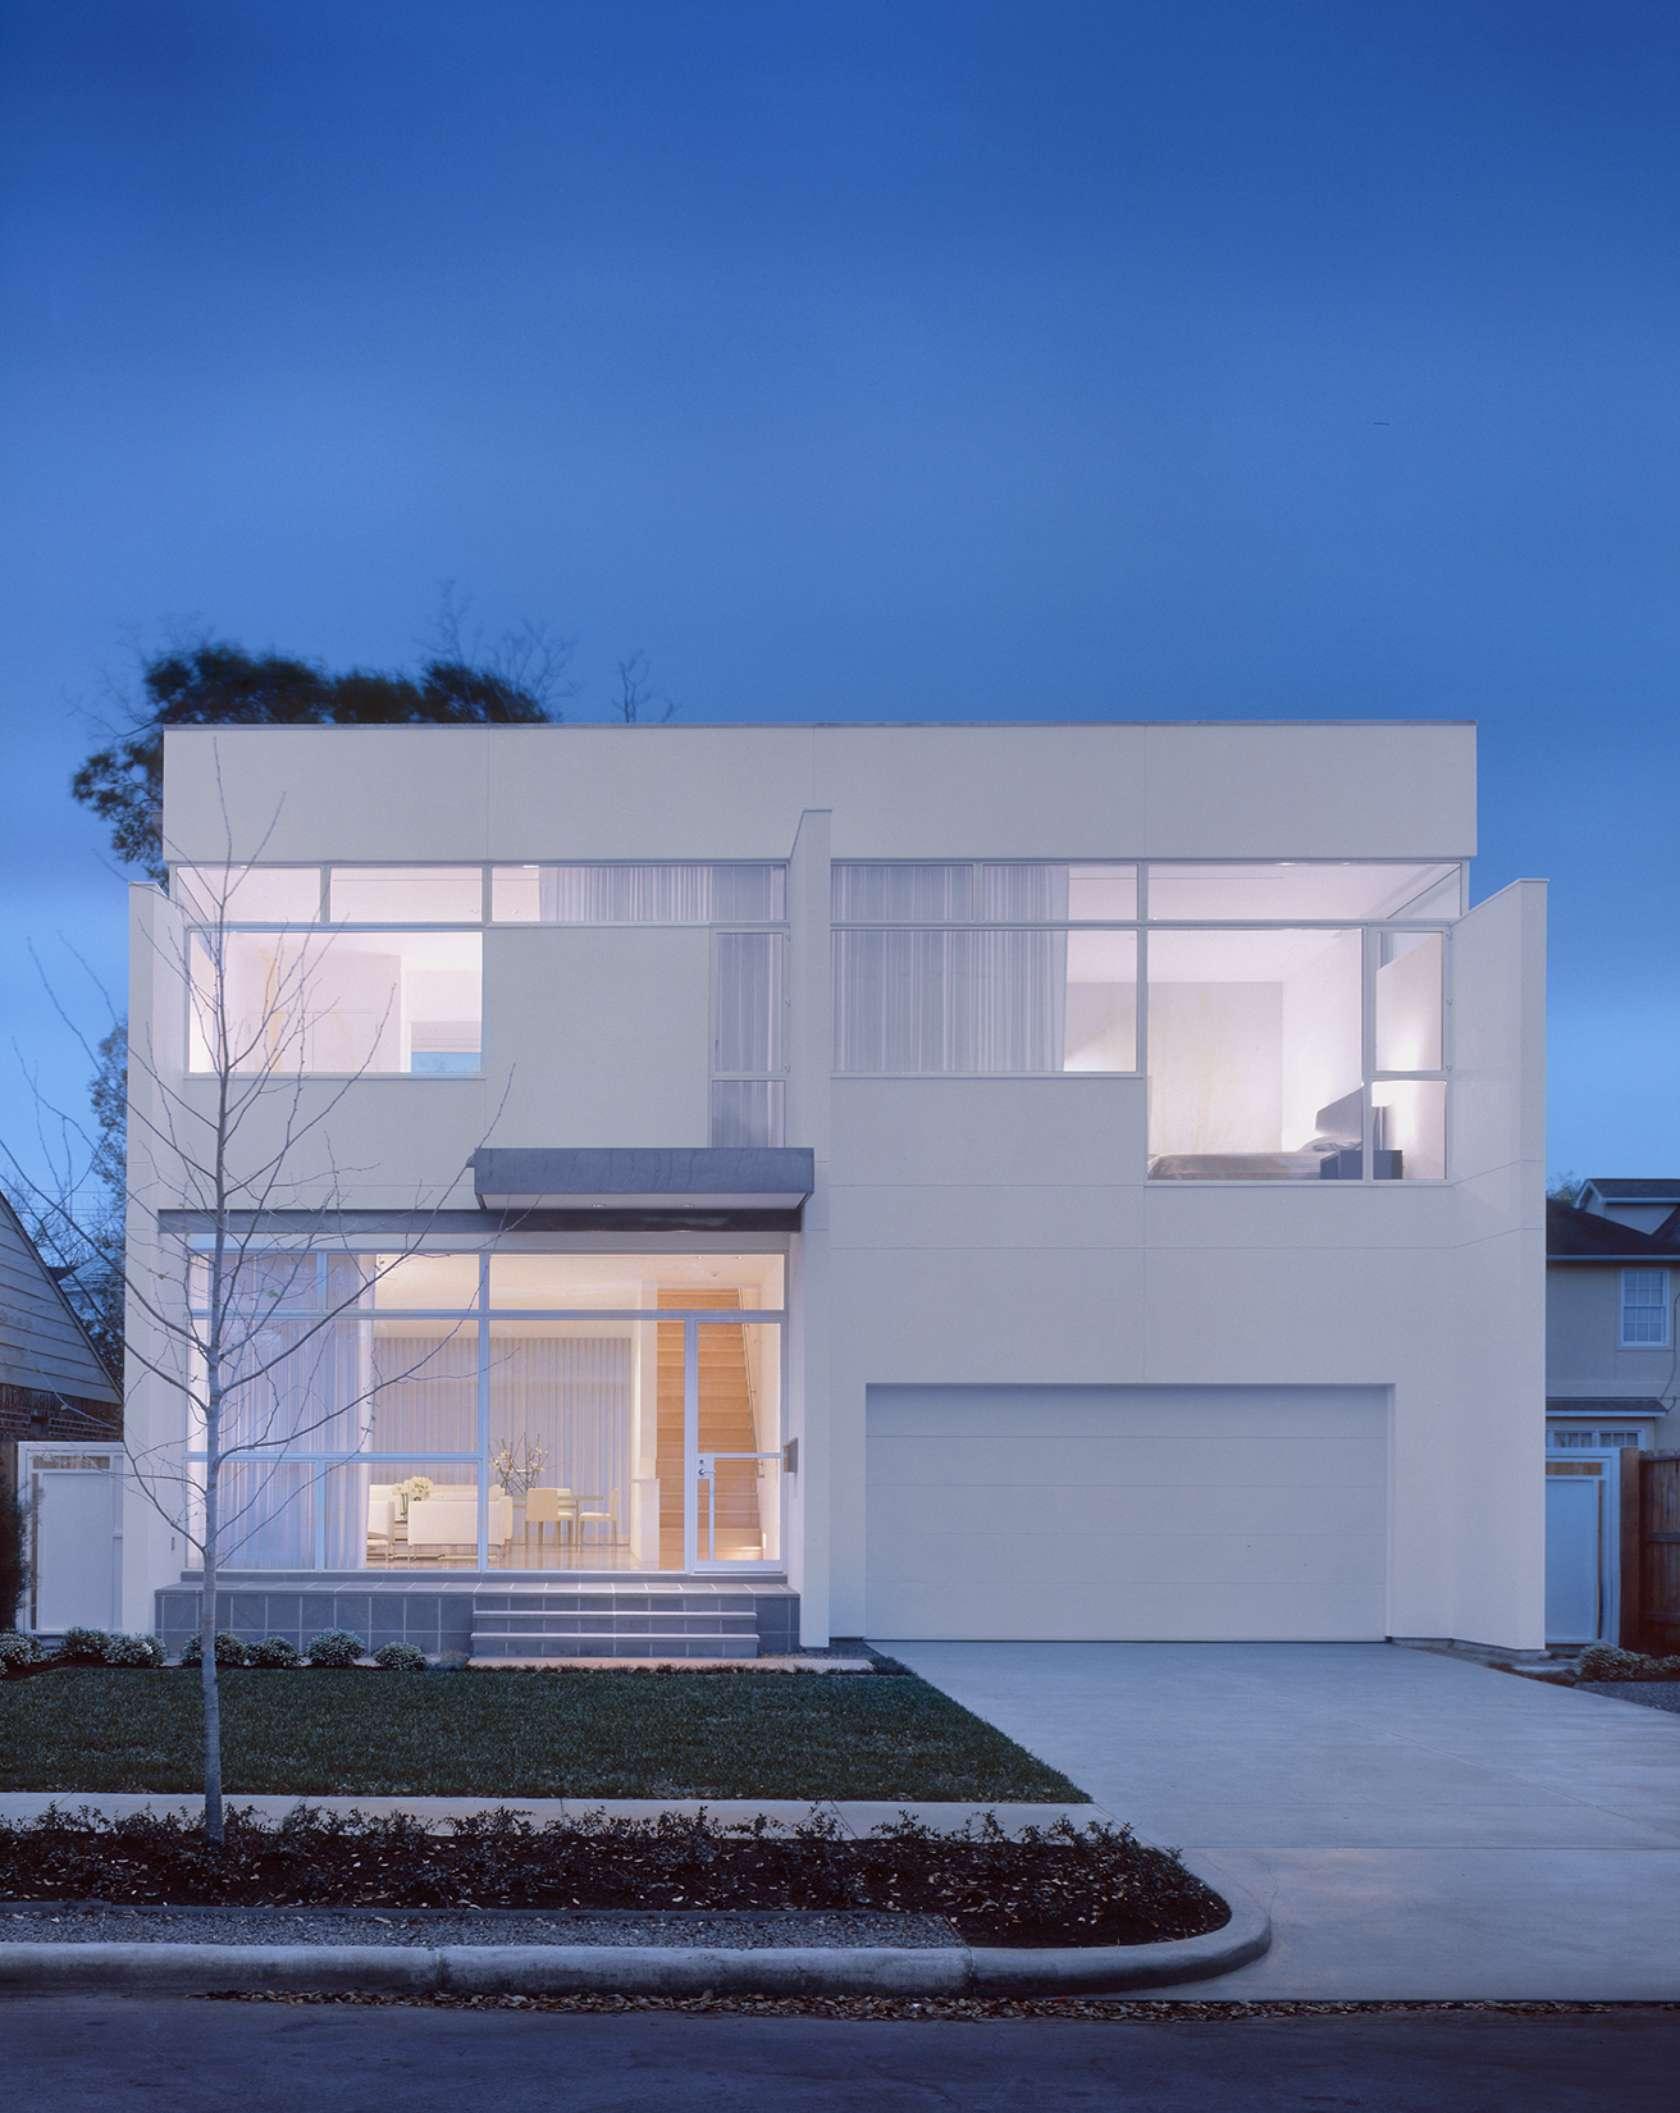 Price Harrison Architect And Associates Pllc Architizer